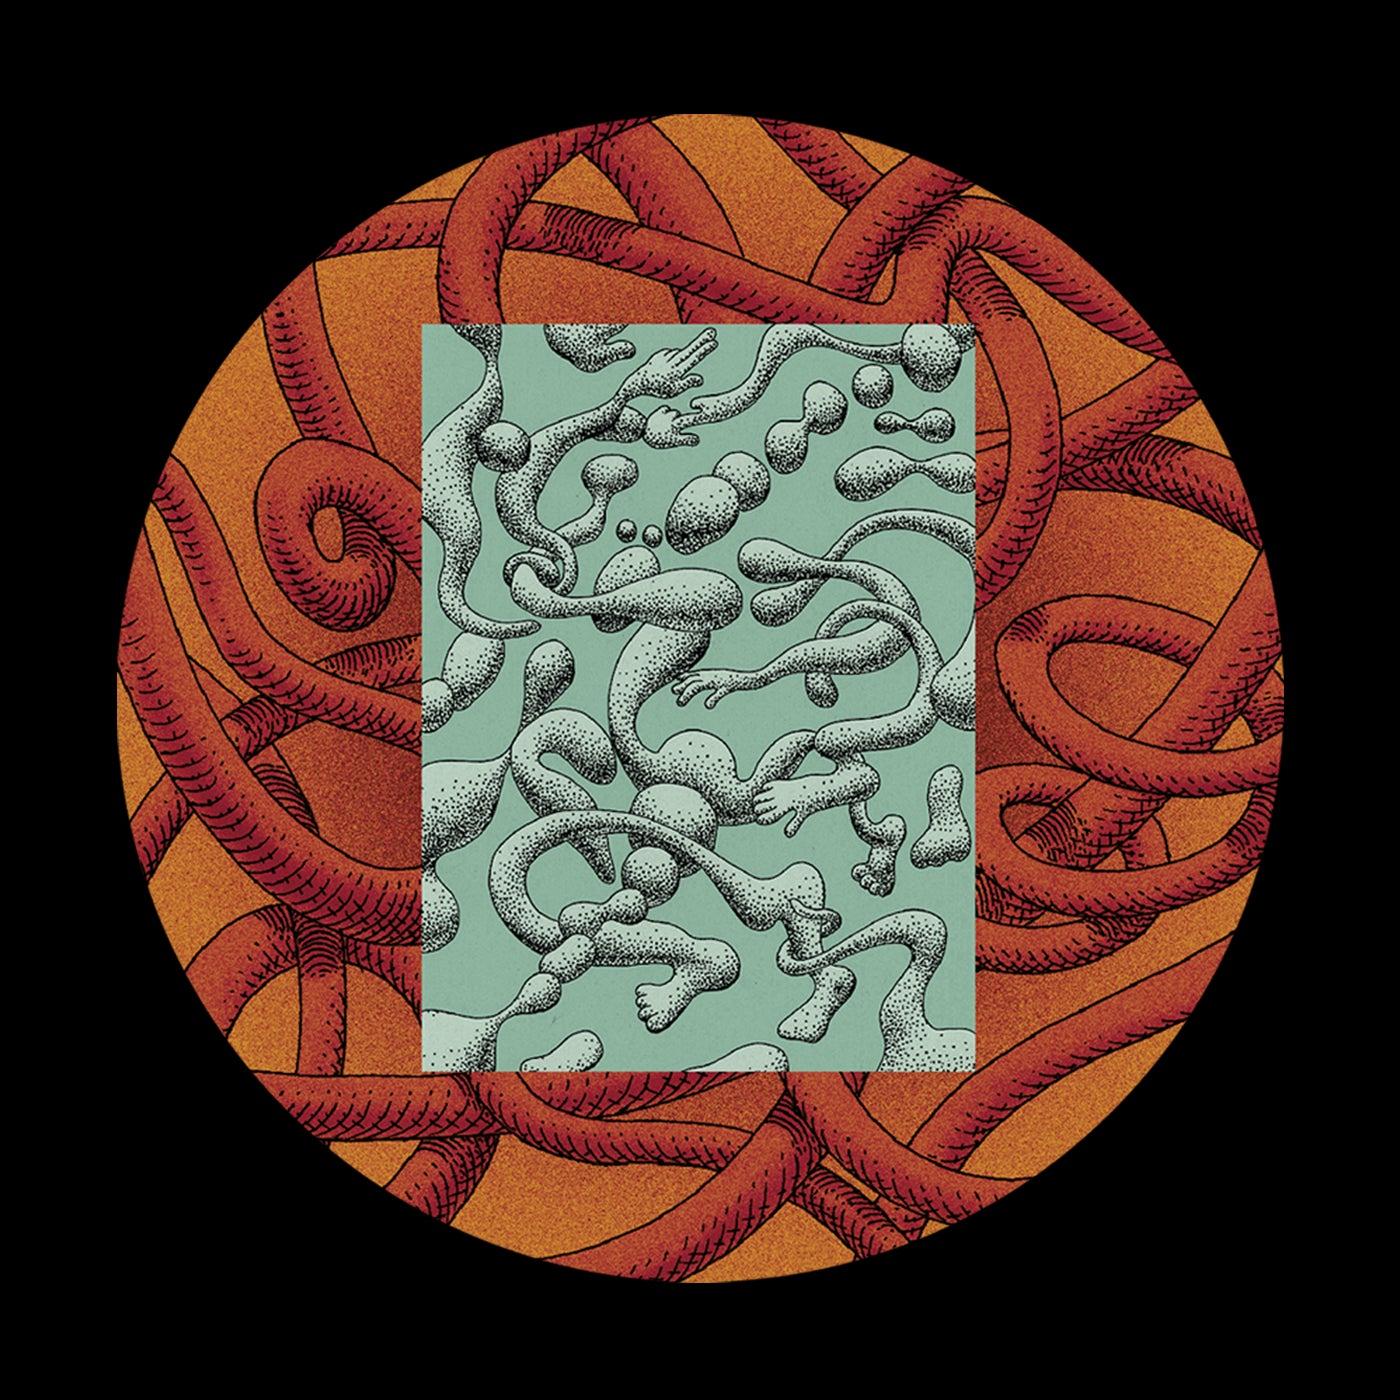 Clutch (Bakongo Remix)